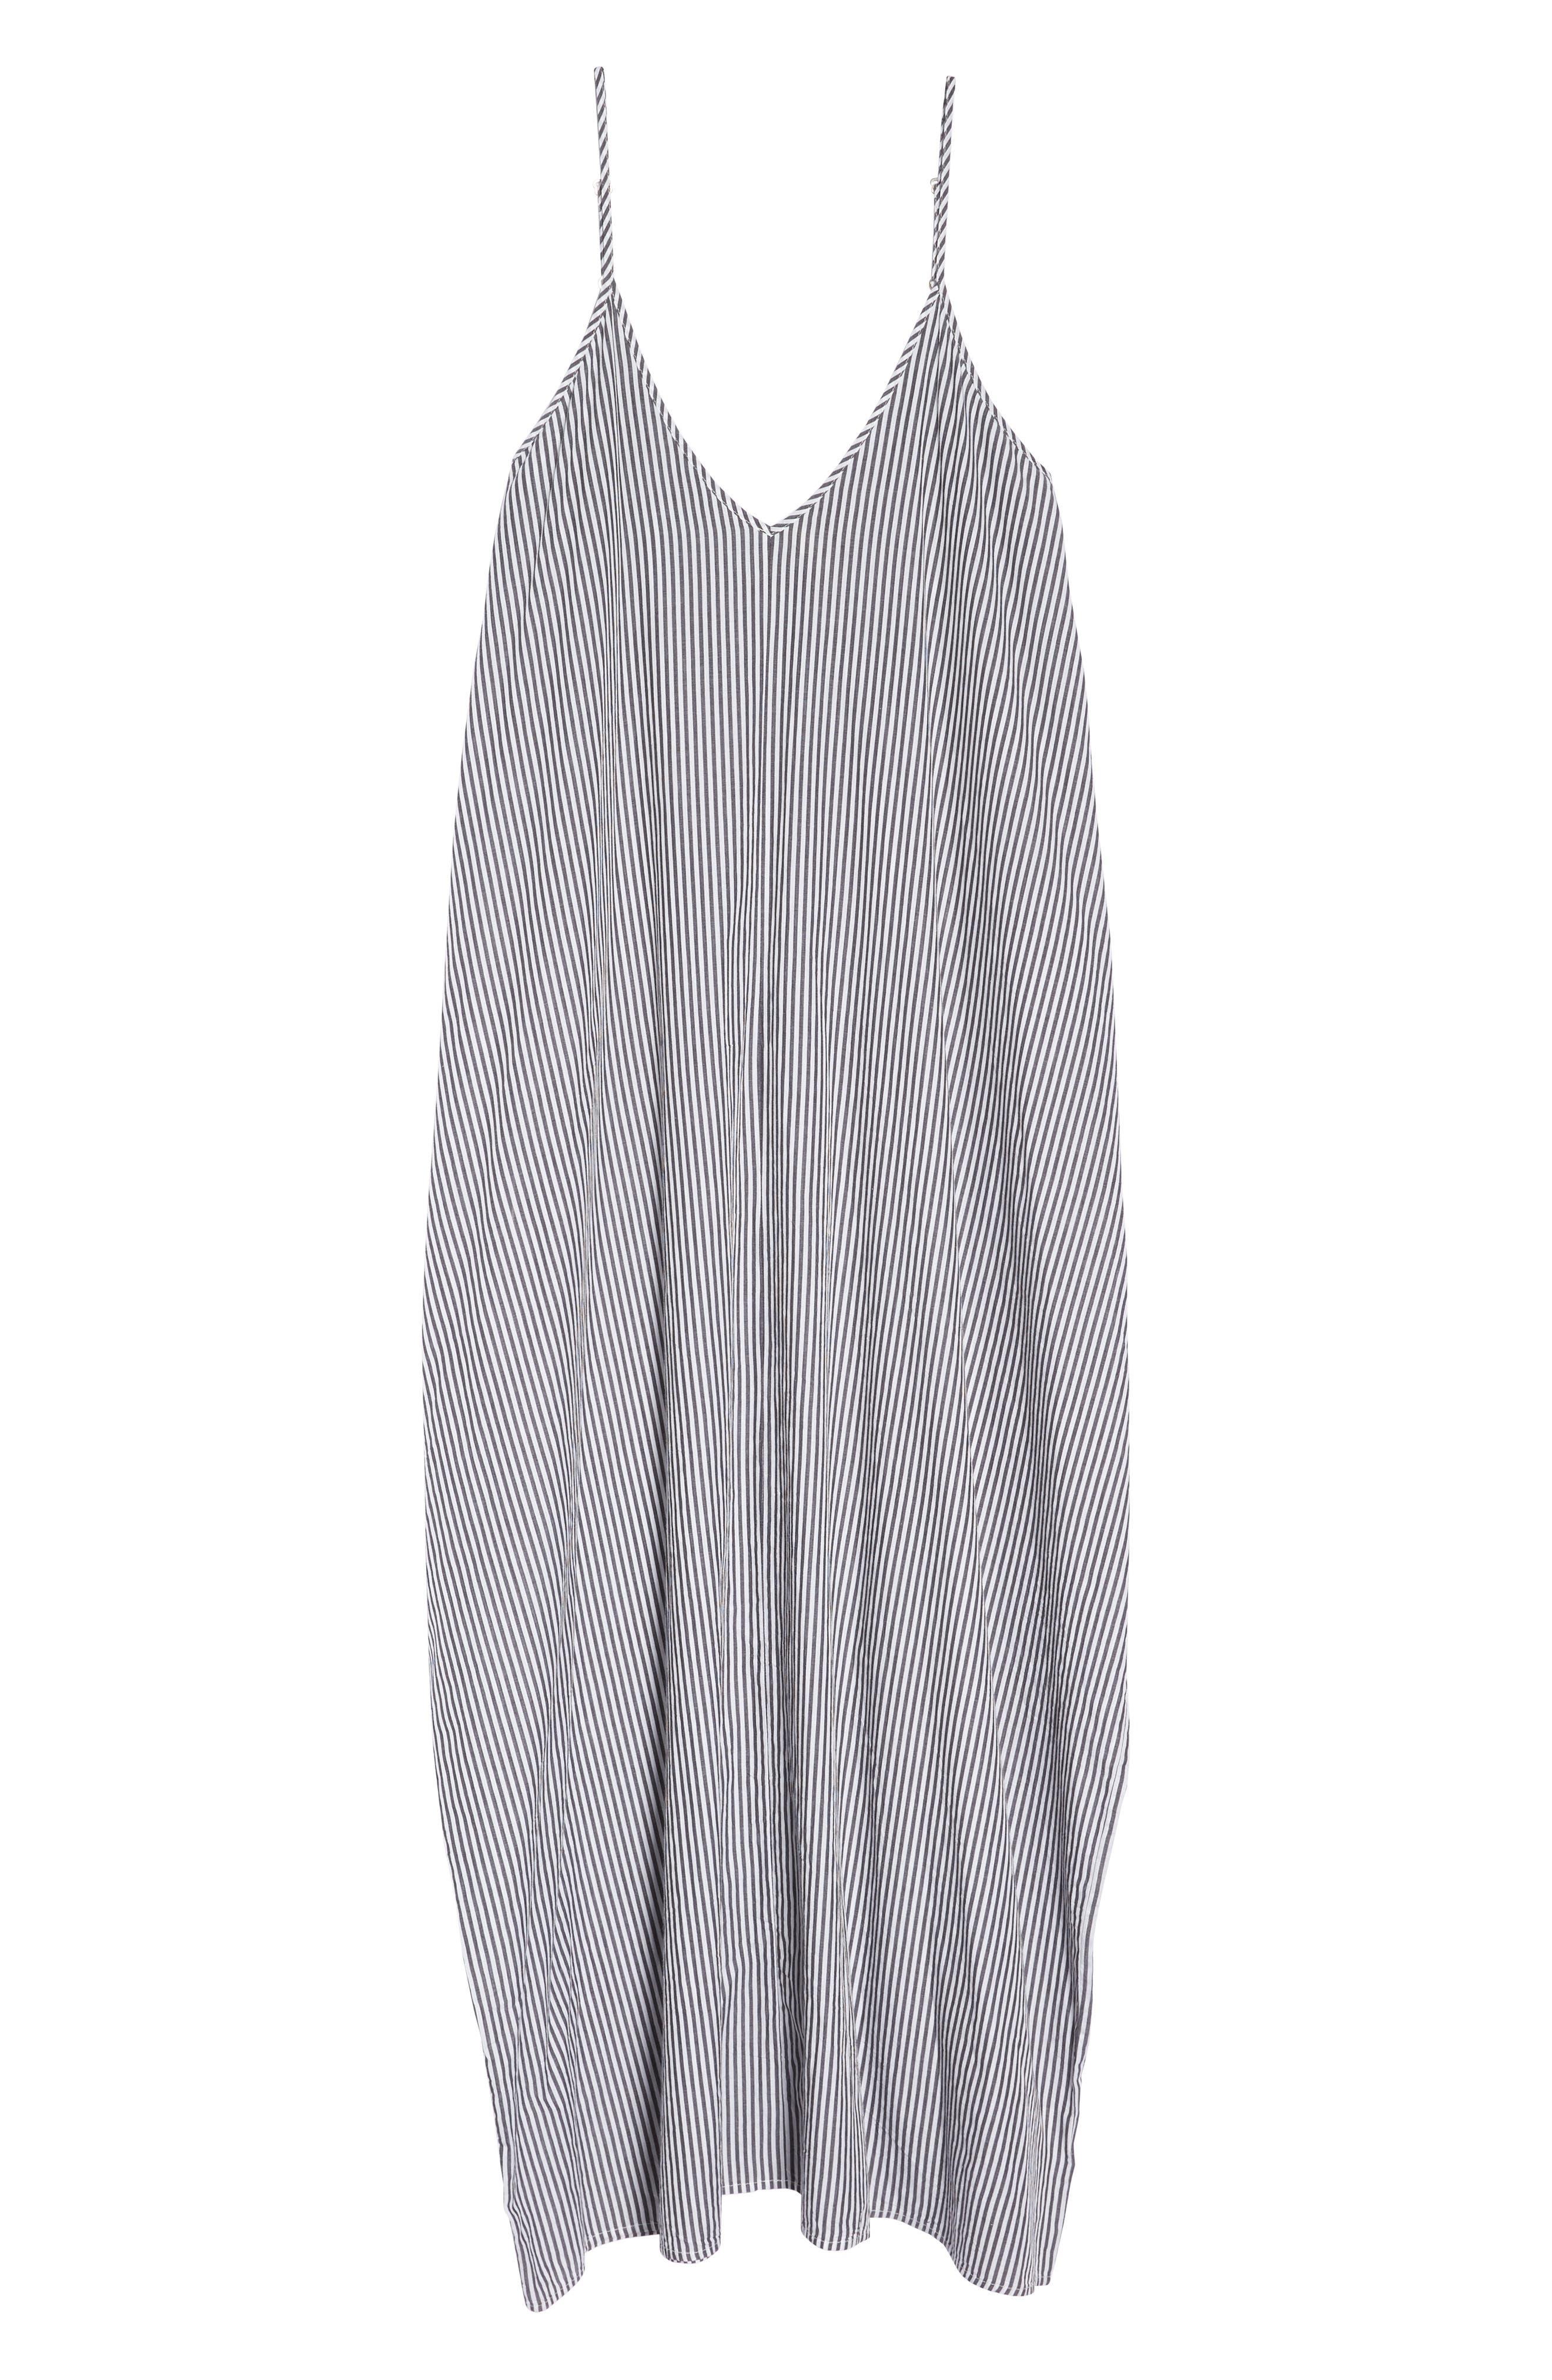 Cover-Up Maxi Dress,                             Alternate thumbnail 6, color,                             BLACK/ WHITE